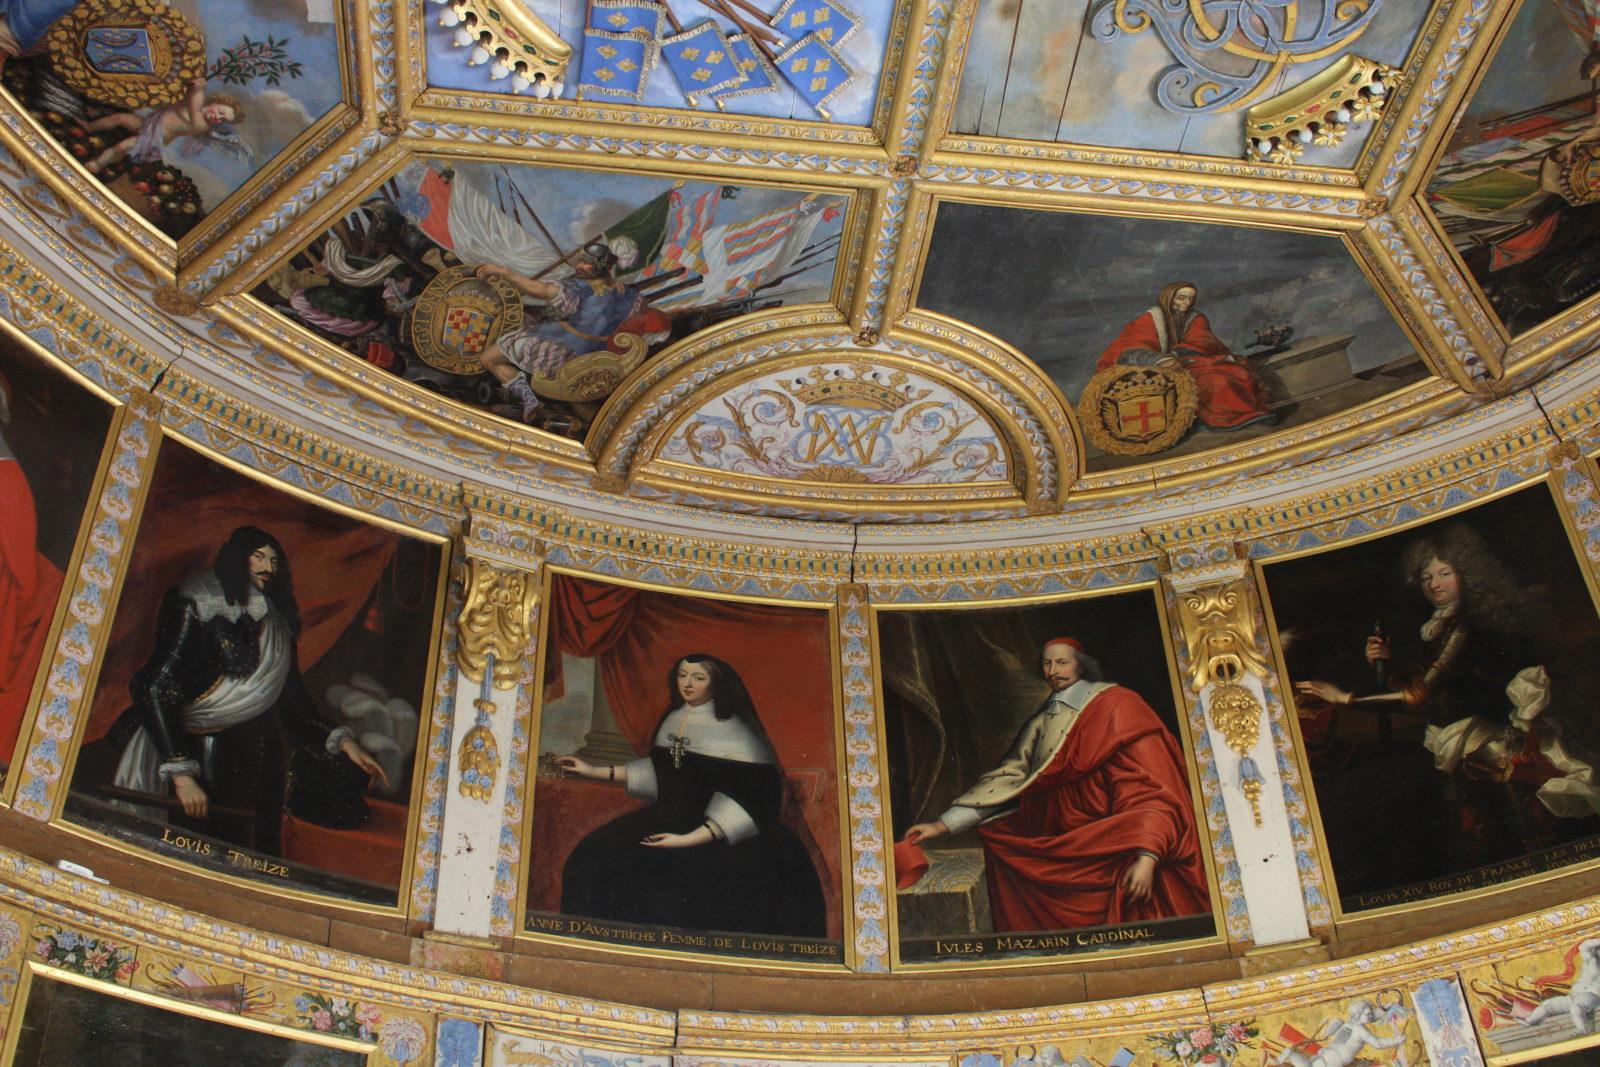 Bussy-Rabutin Salle de la tour dorée Mazarin